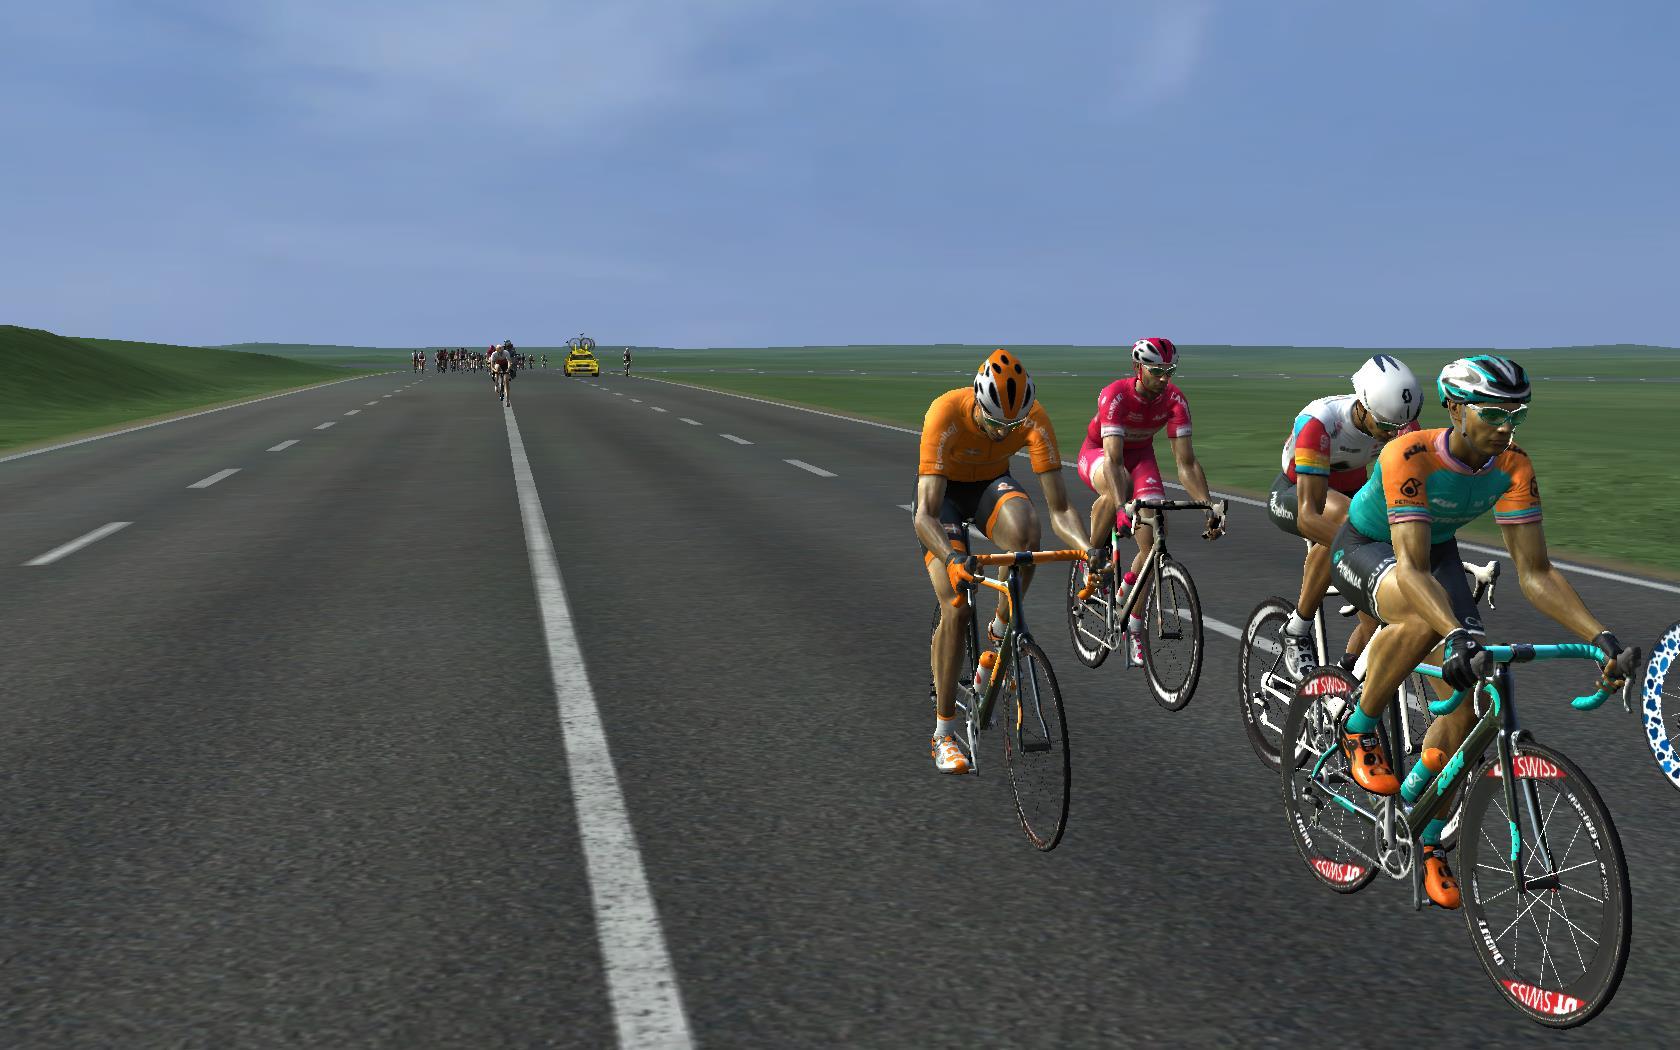 pcmdaily.com/images/mg/2018/Races/C2/USAPCC/1/PCM0007.jpg